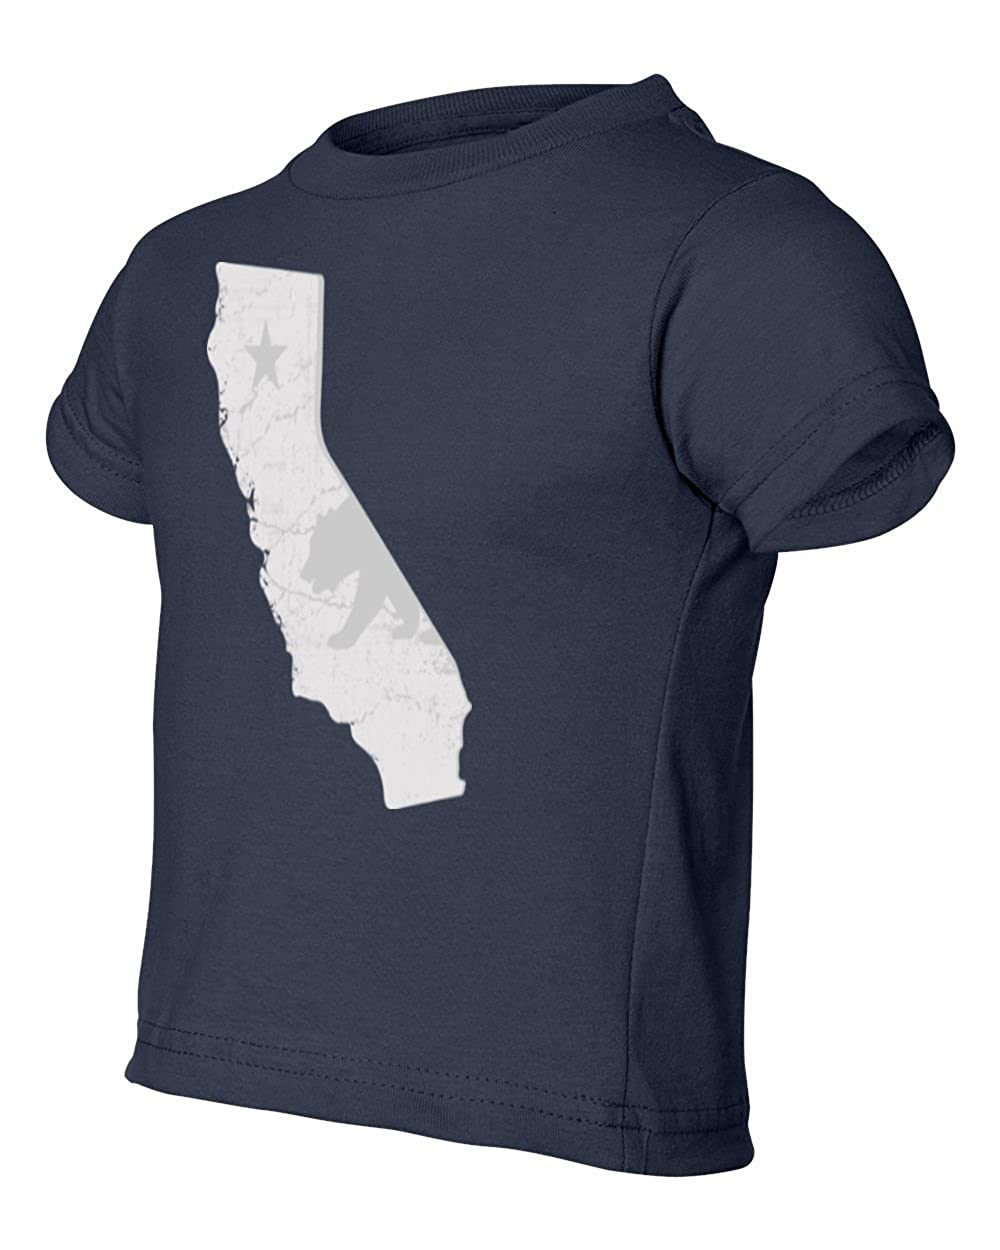 Societee California State Map Toddler Little Boy Infant T-Shirt